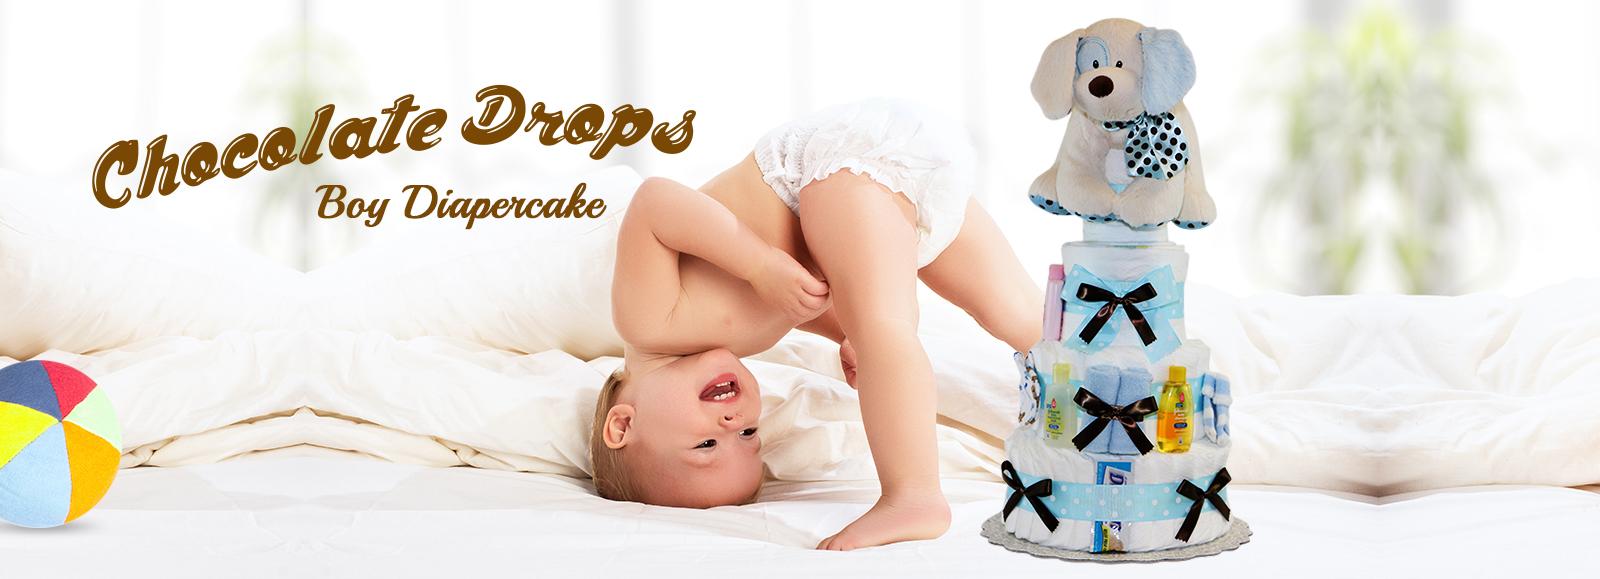 Chocolate Drops Boy